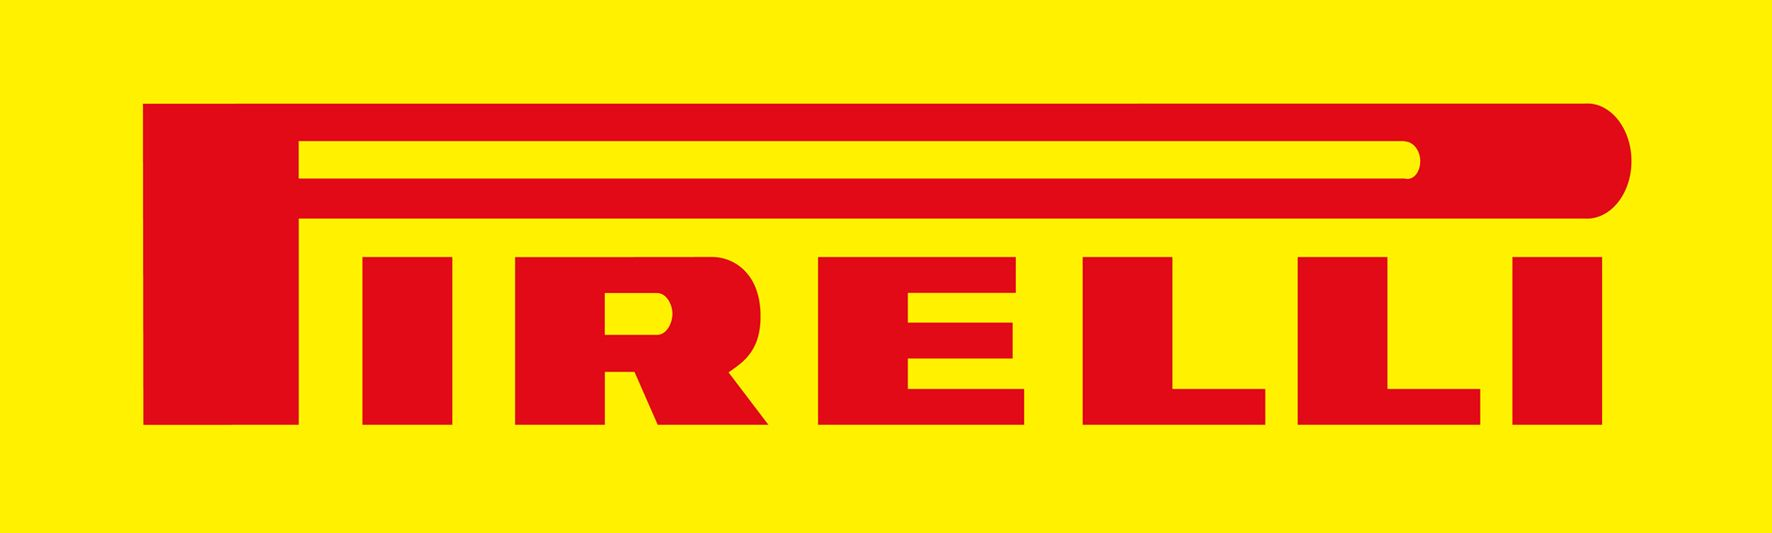 pirelli_logo_HD.jpg